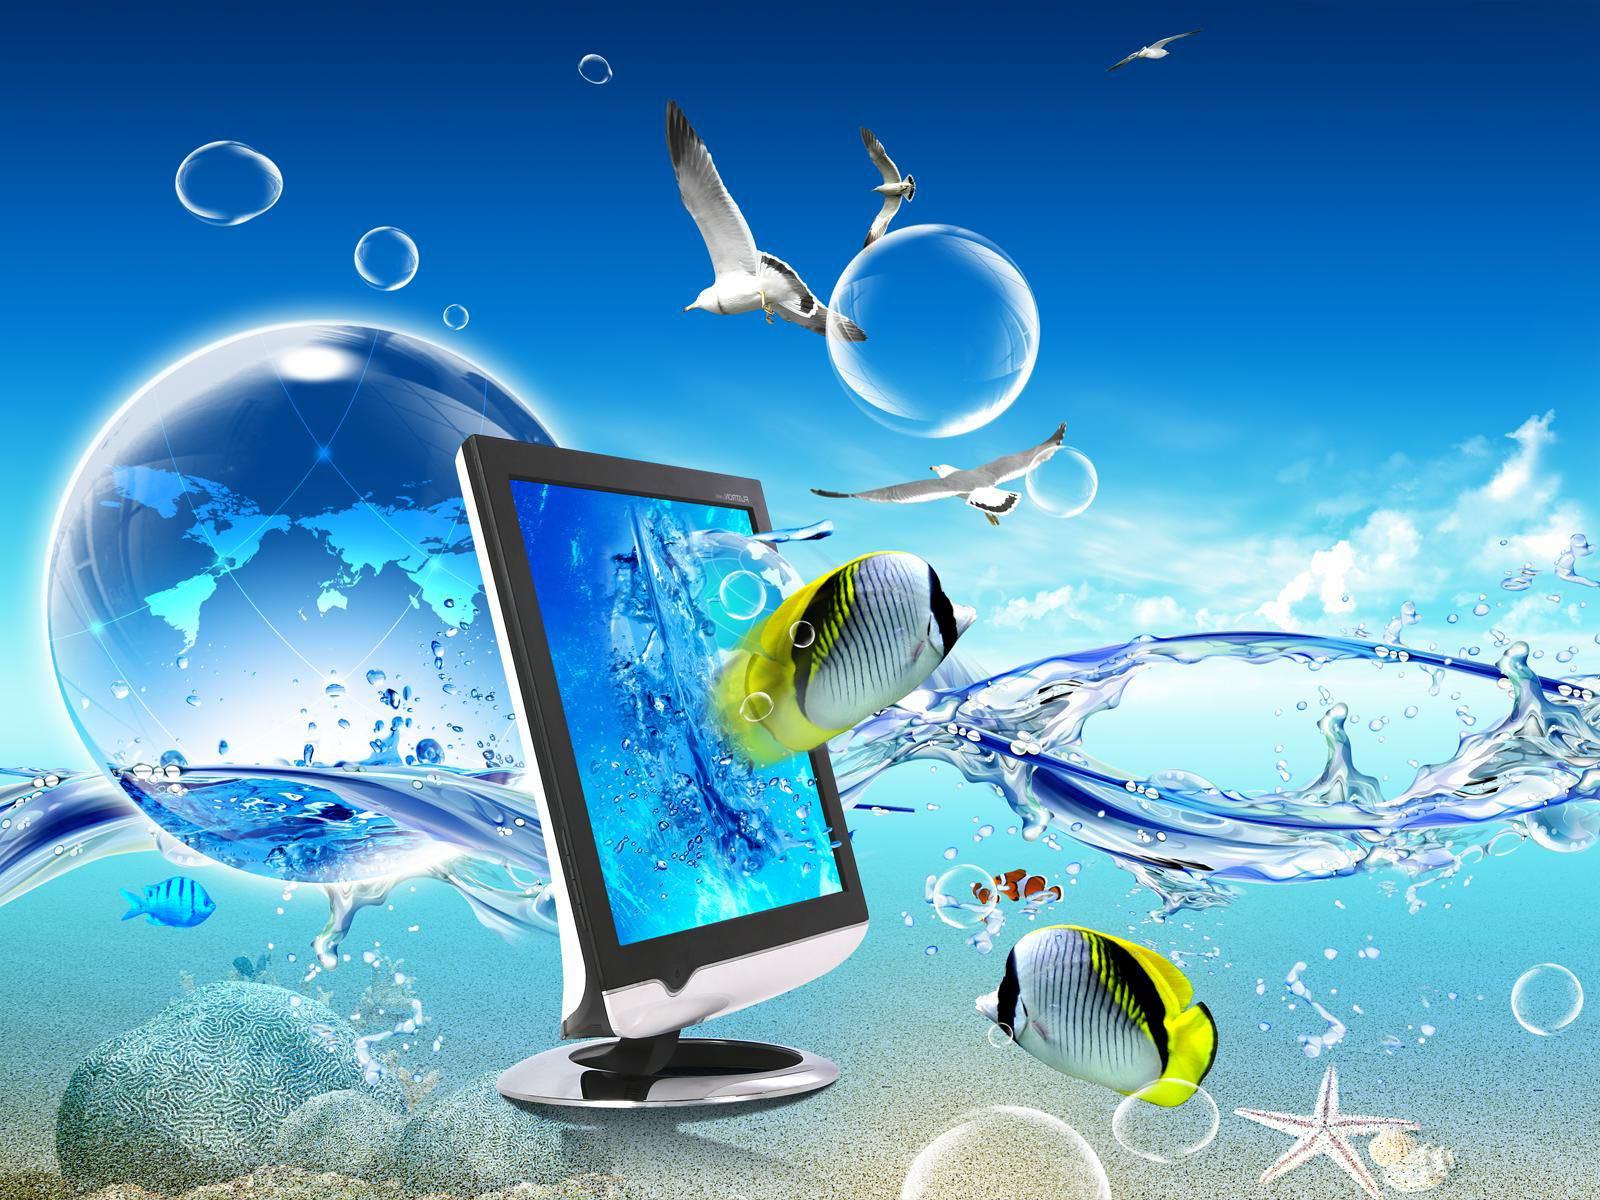 Best Desktop HD Wallpaper - PC Desktop Wallpaper